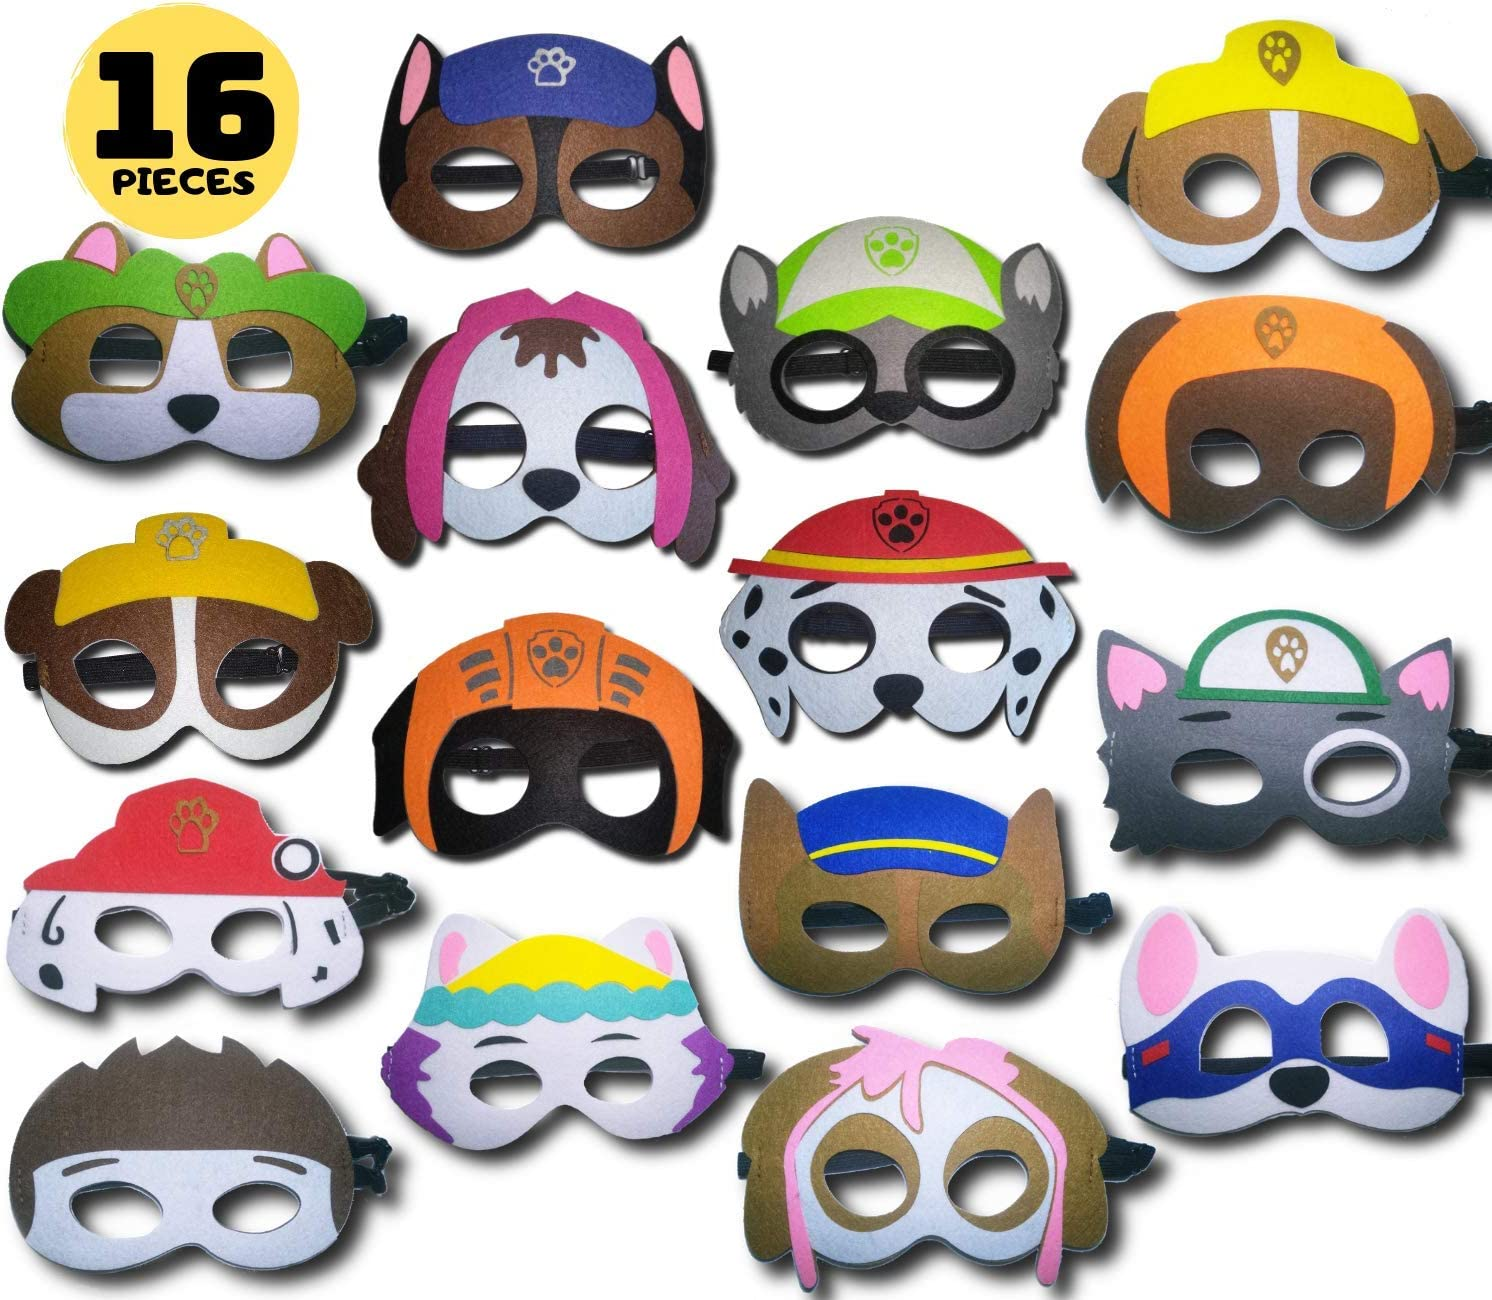 Trainer Pups Mask Paw Pups Felt Mask Felt Mask Costume